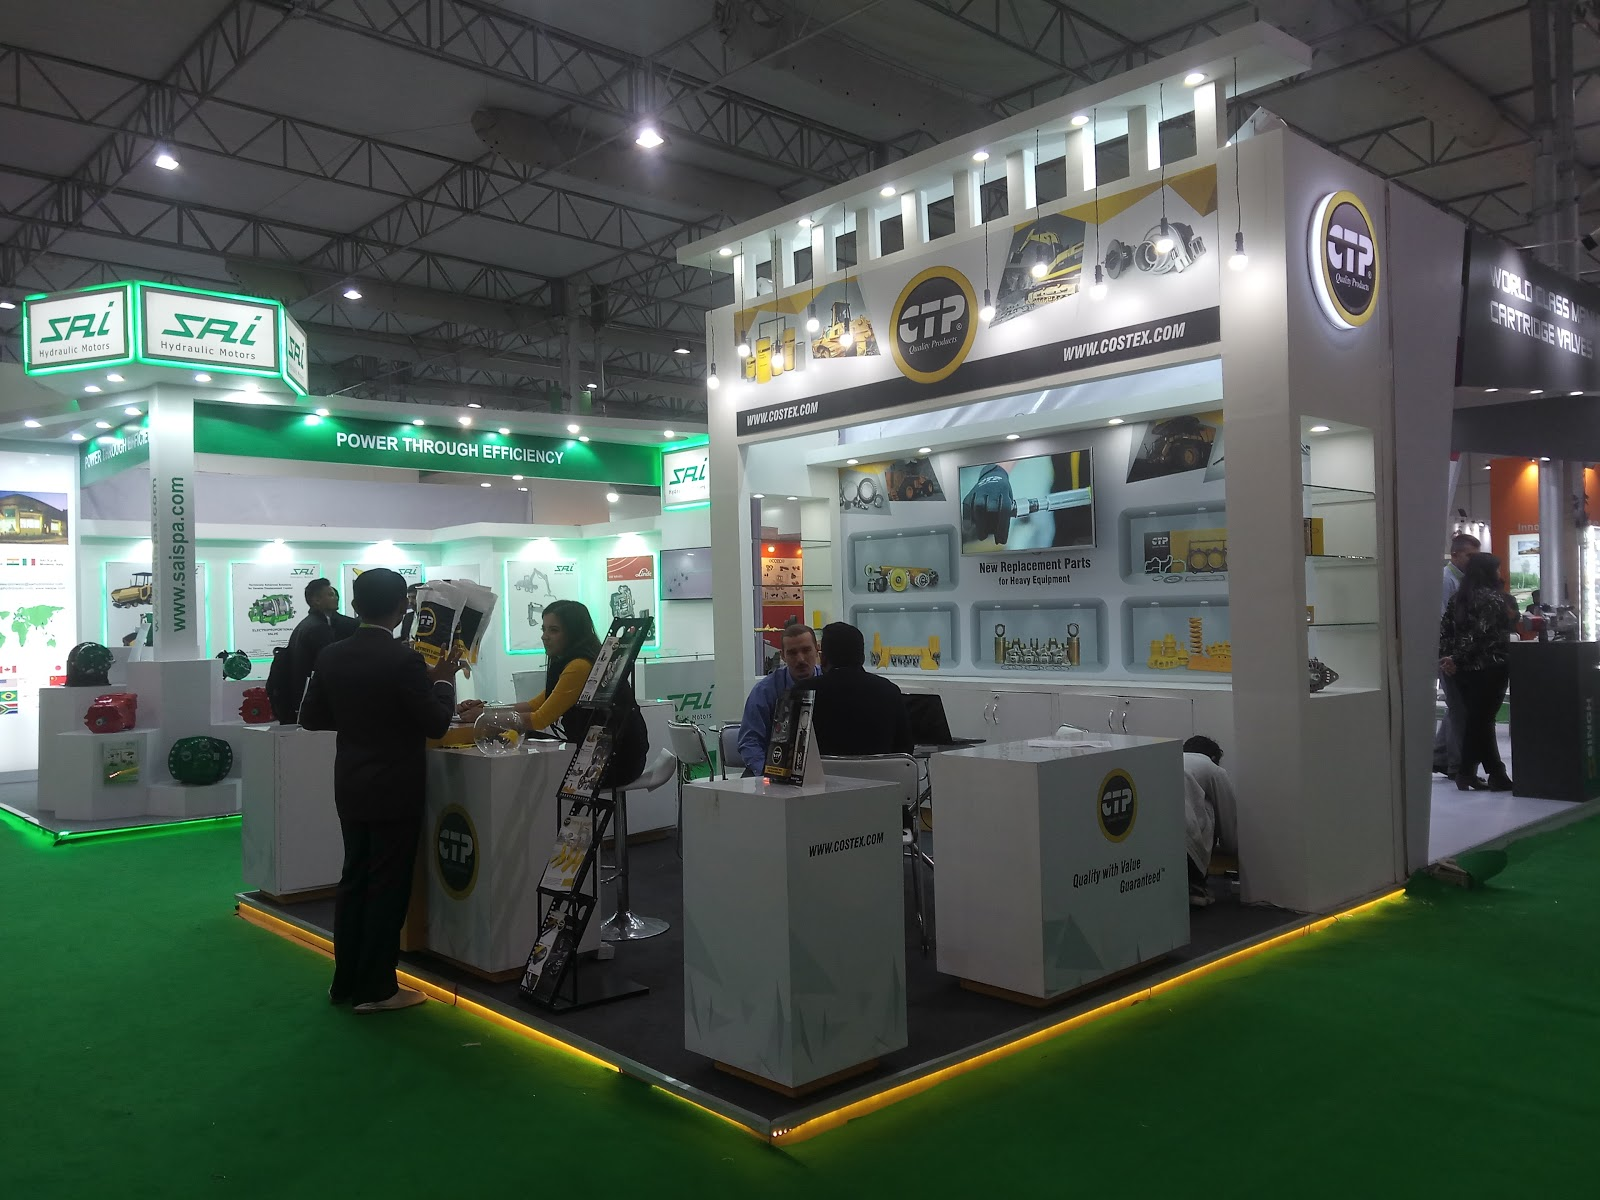 best exhibition partner in india